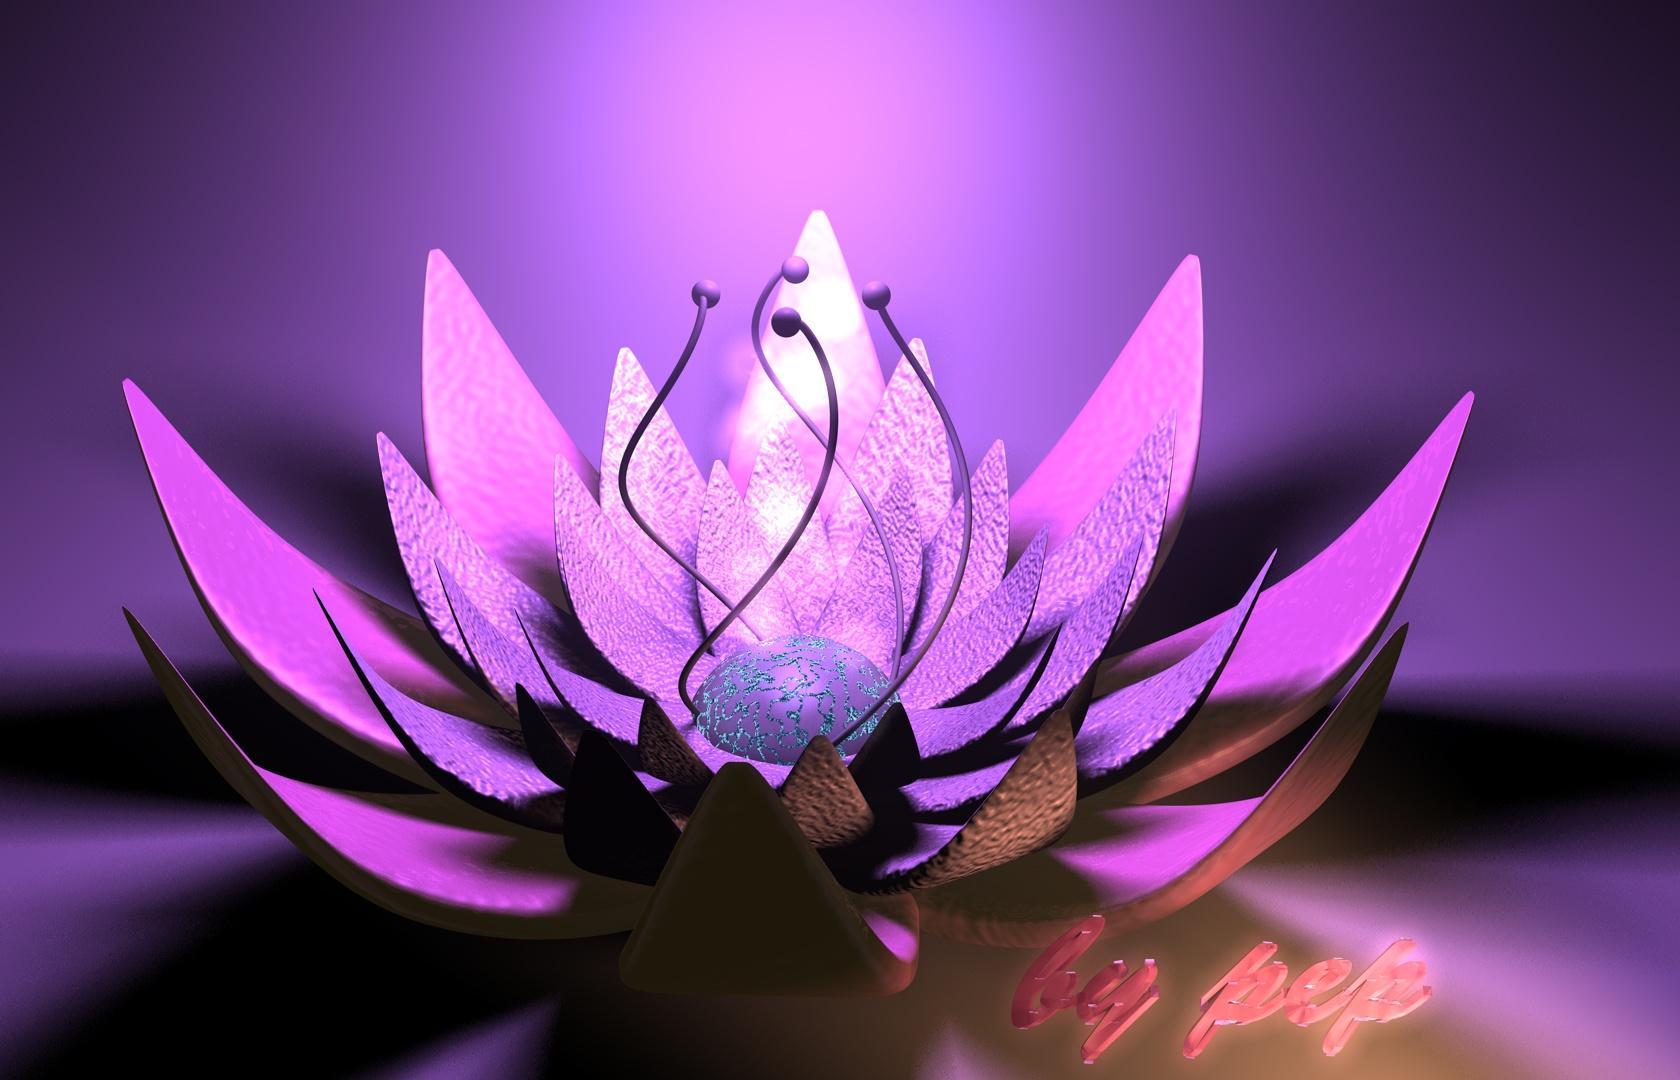 Wallpaper fleur 3D by pepgraff on DeviantArt